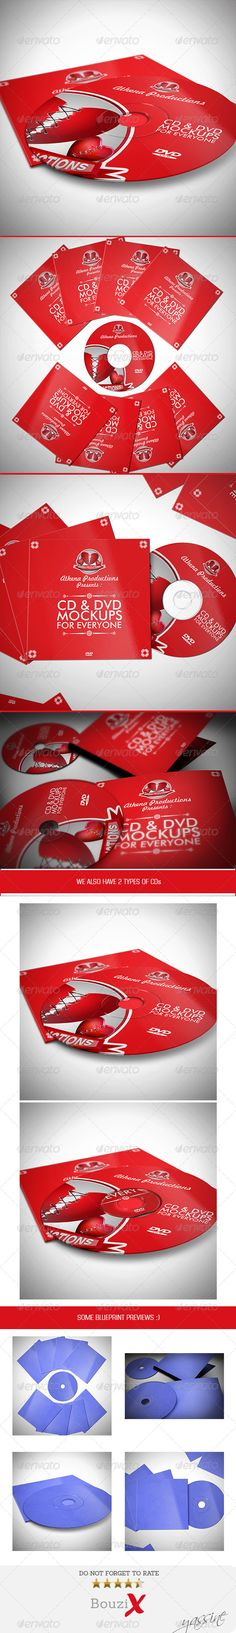 CD Sleeve & Sticker Mockups